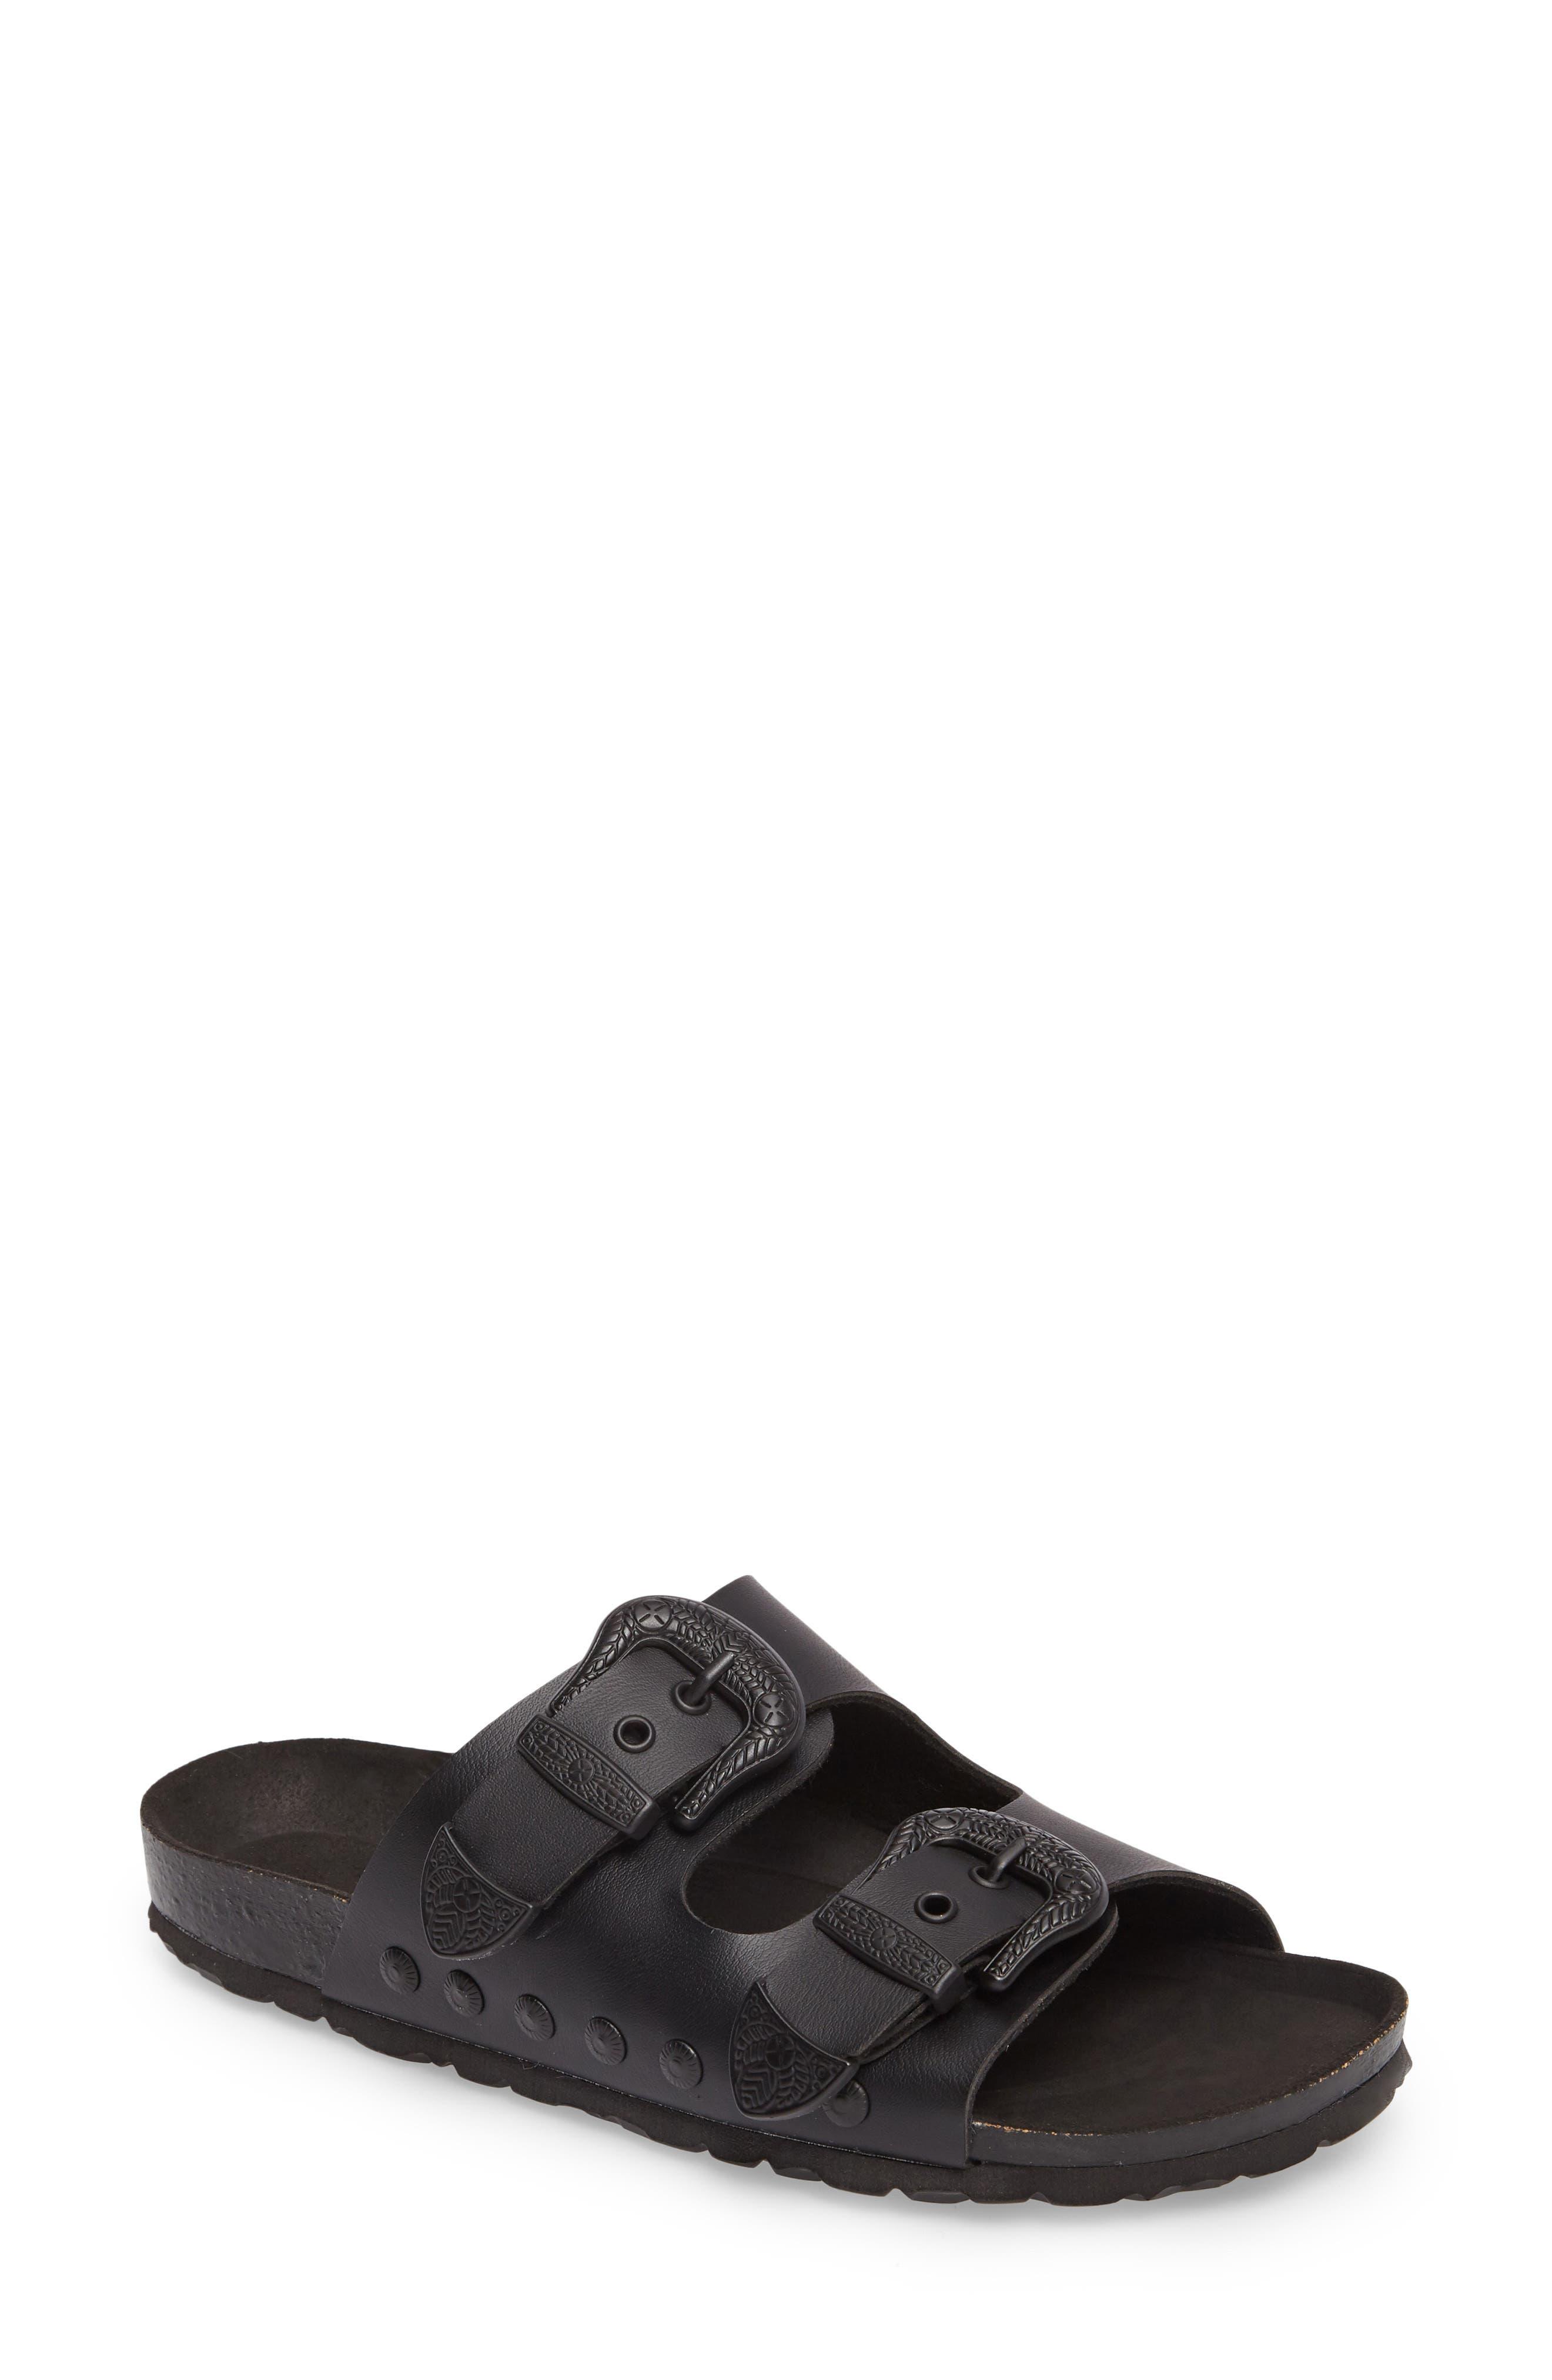 Main Image - Topshop Studded Slide Sandal (Women)